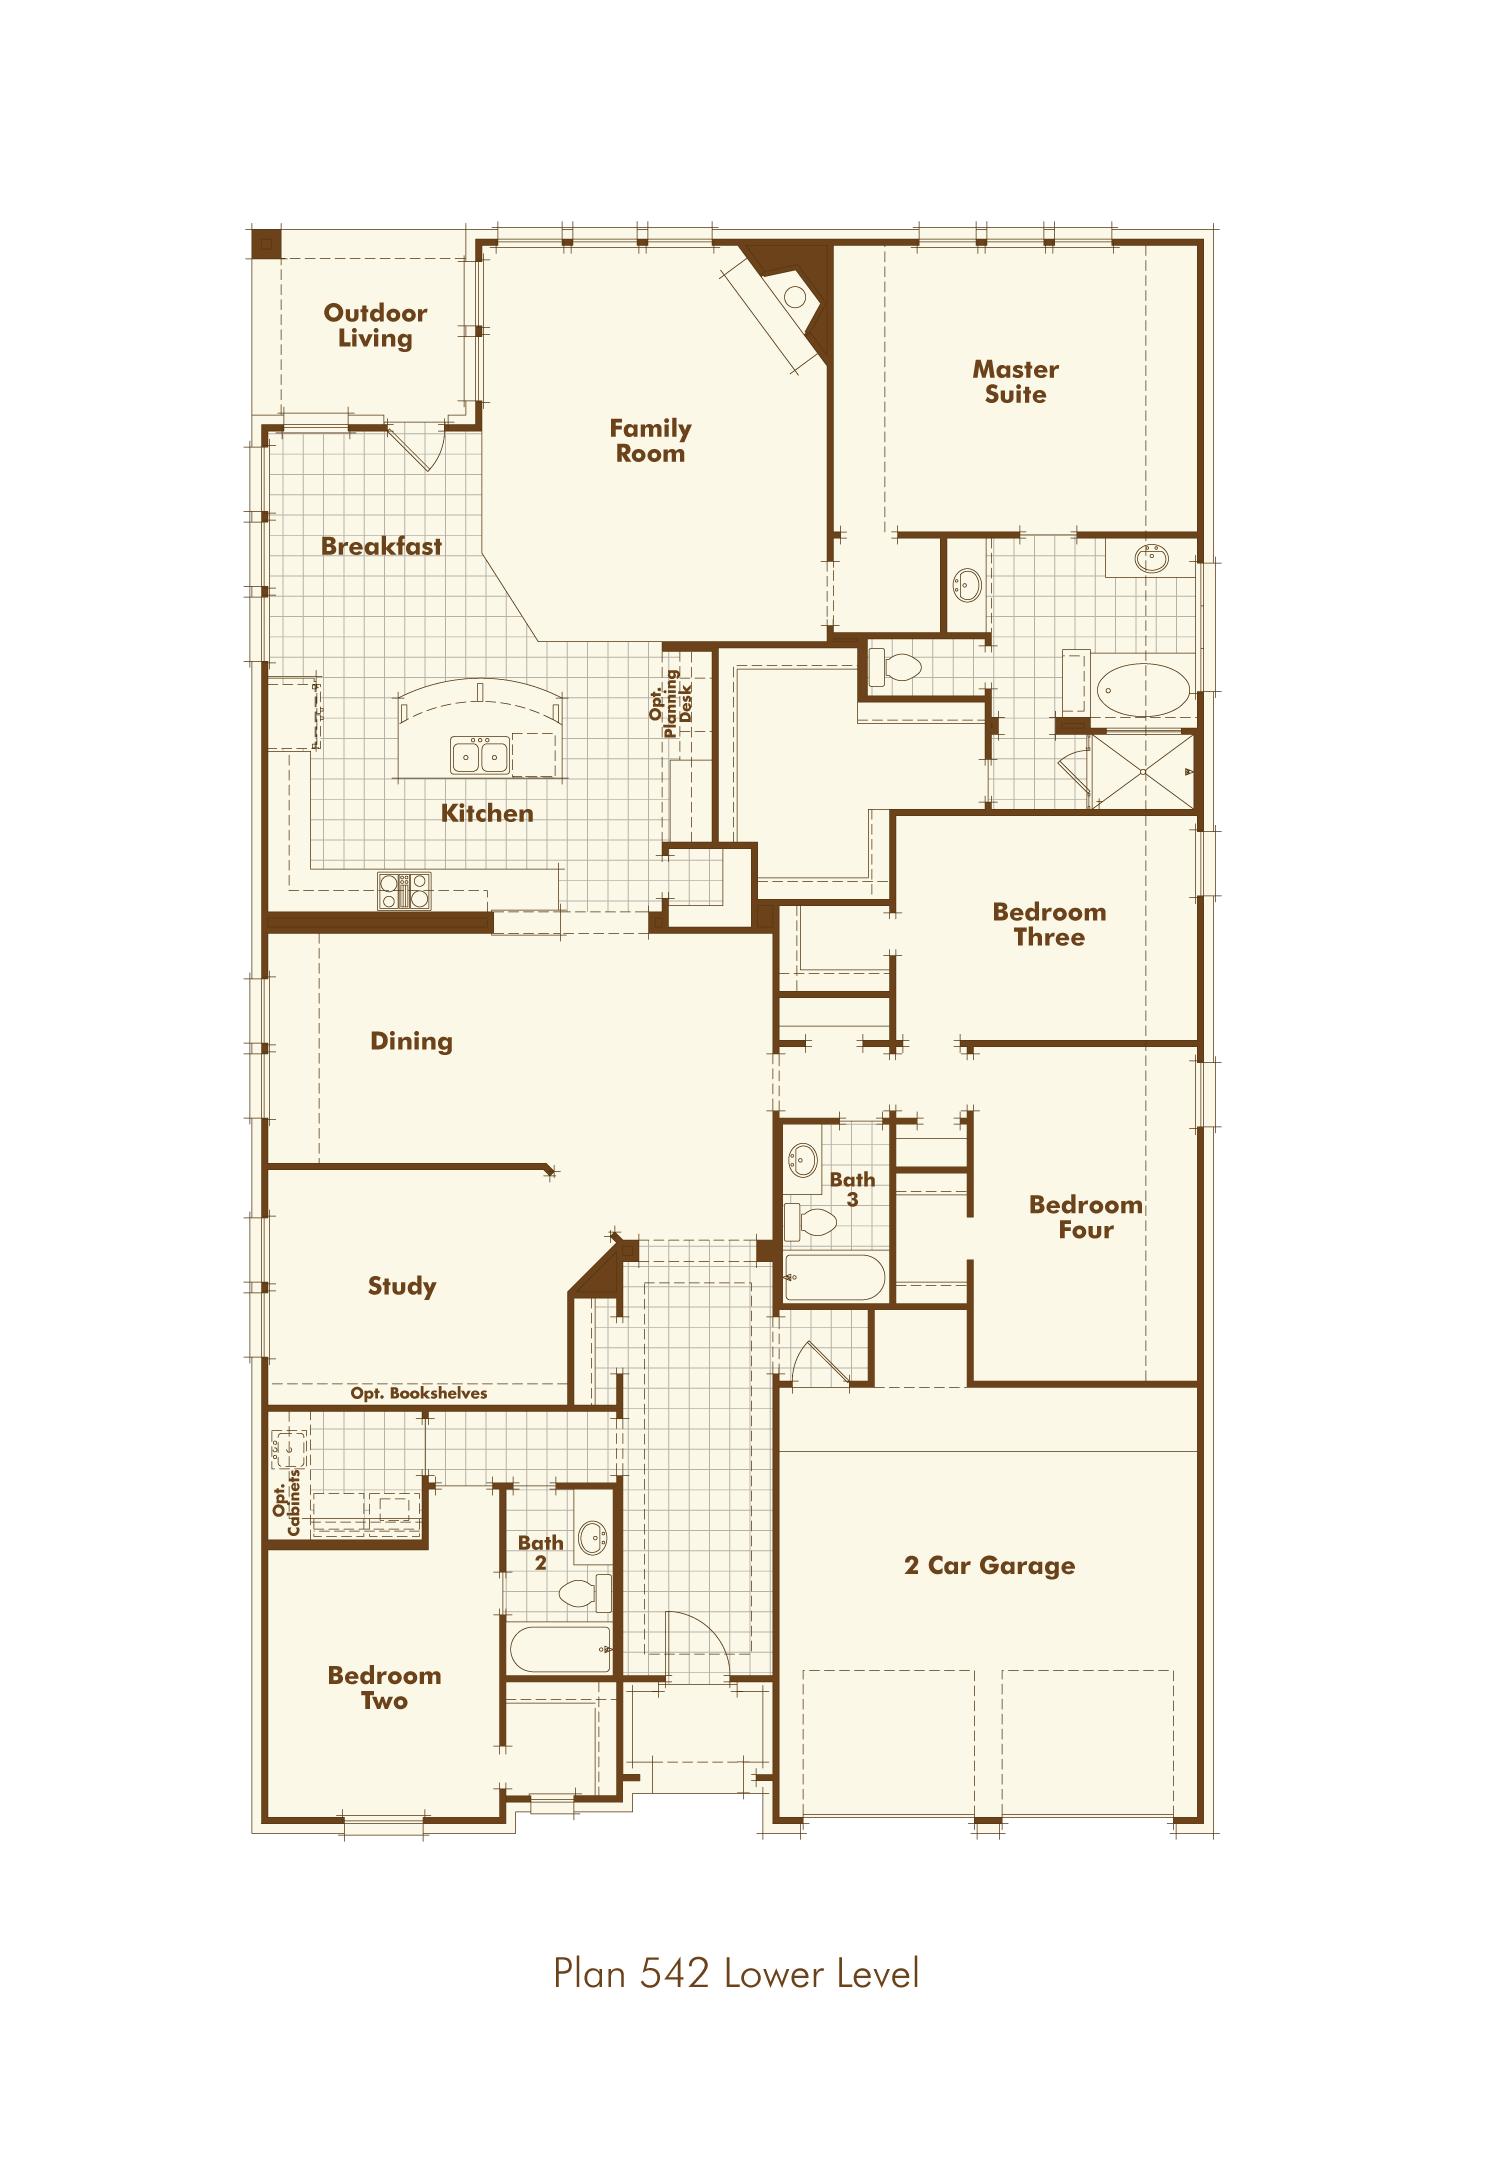 New Home Plan 542 in Richmond, TX 77407